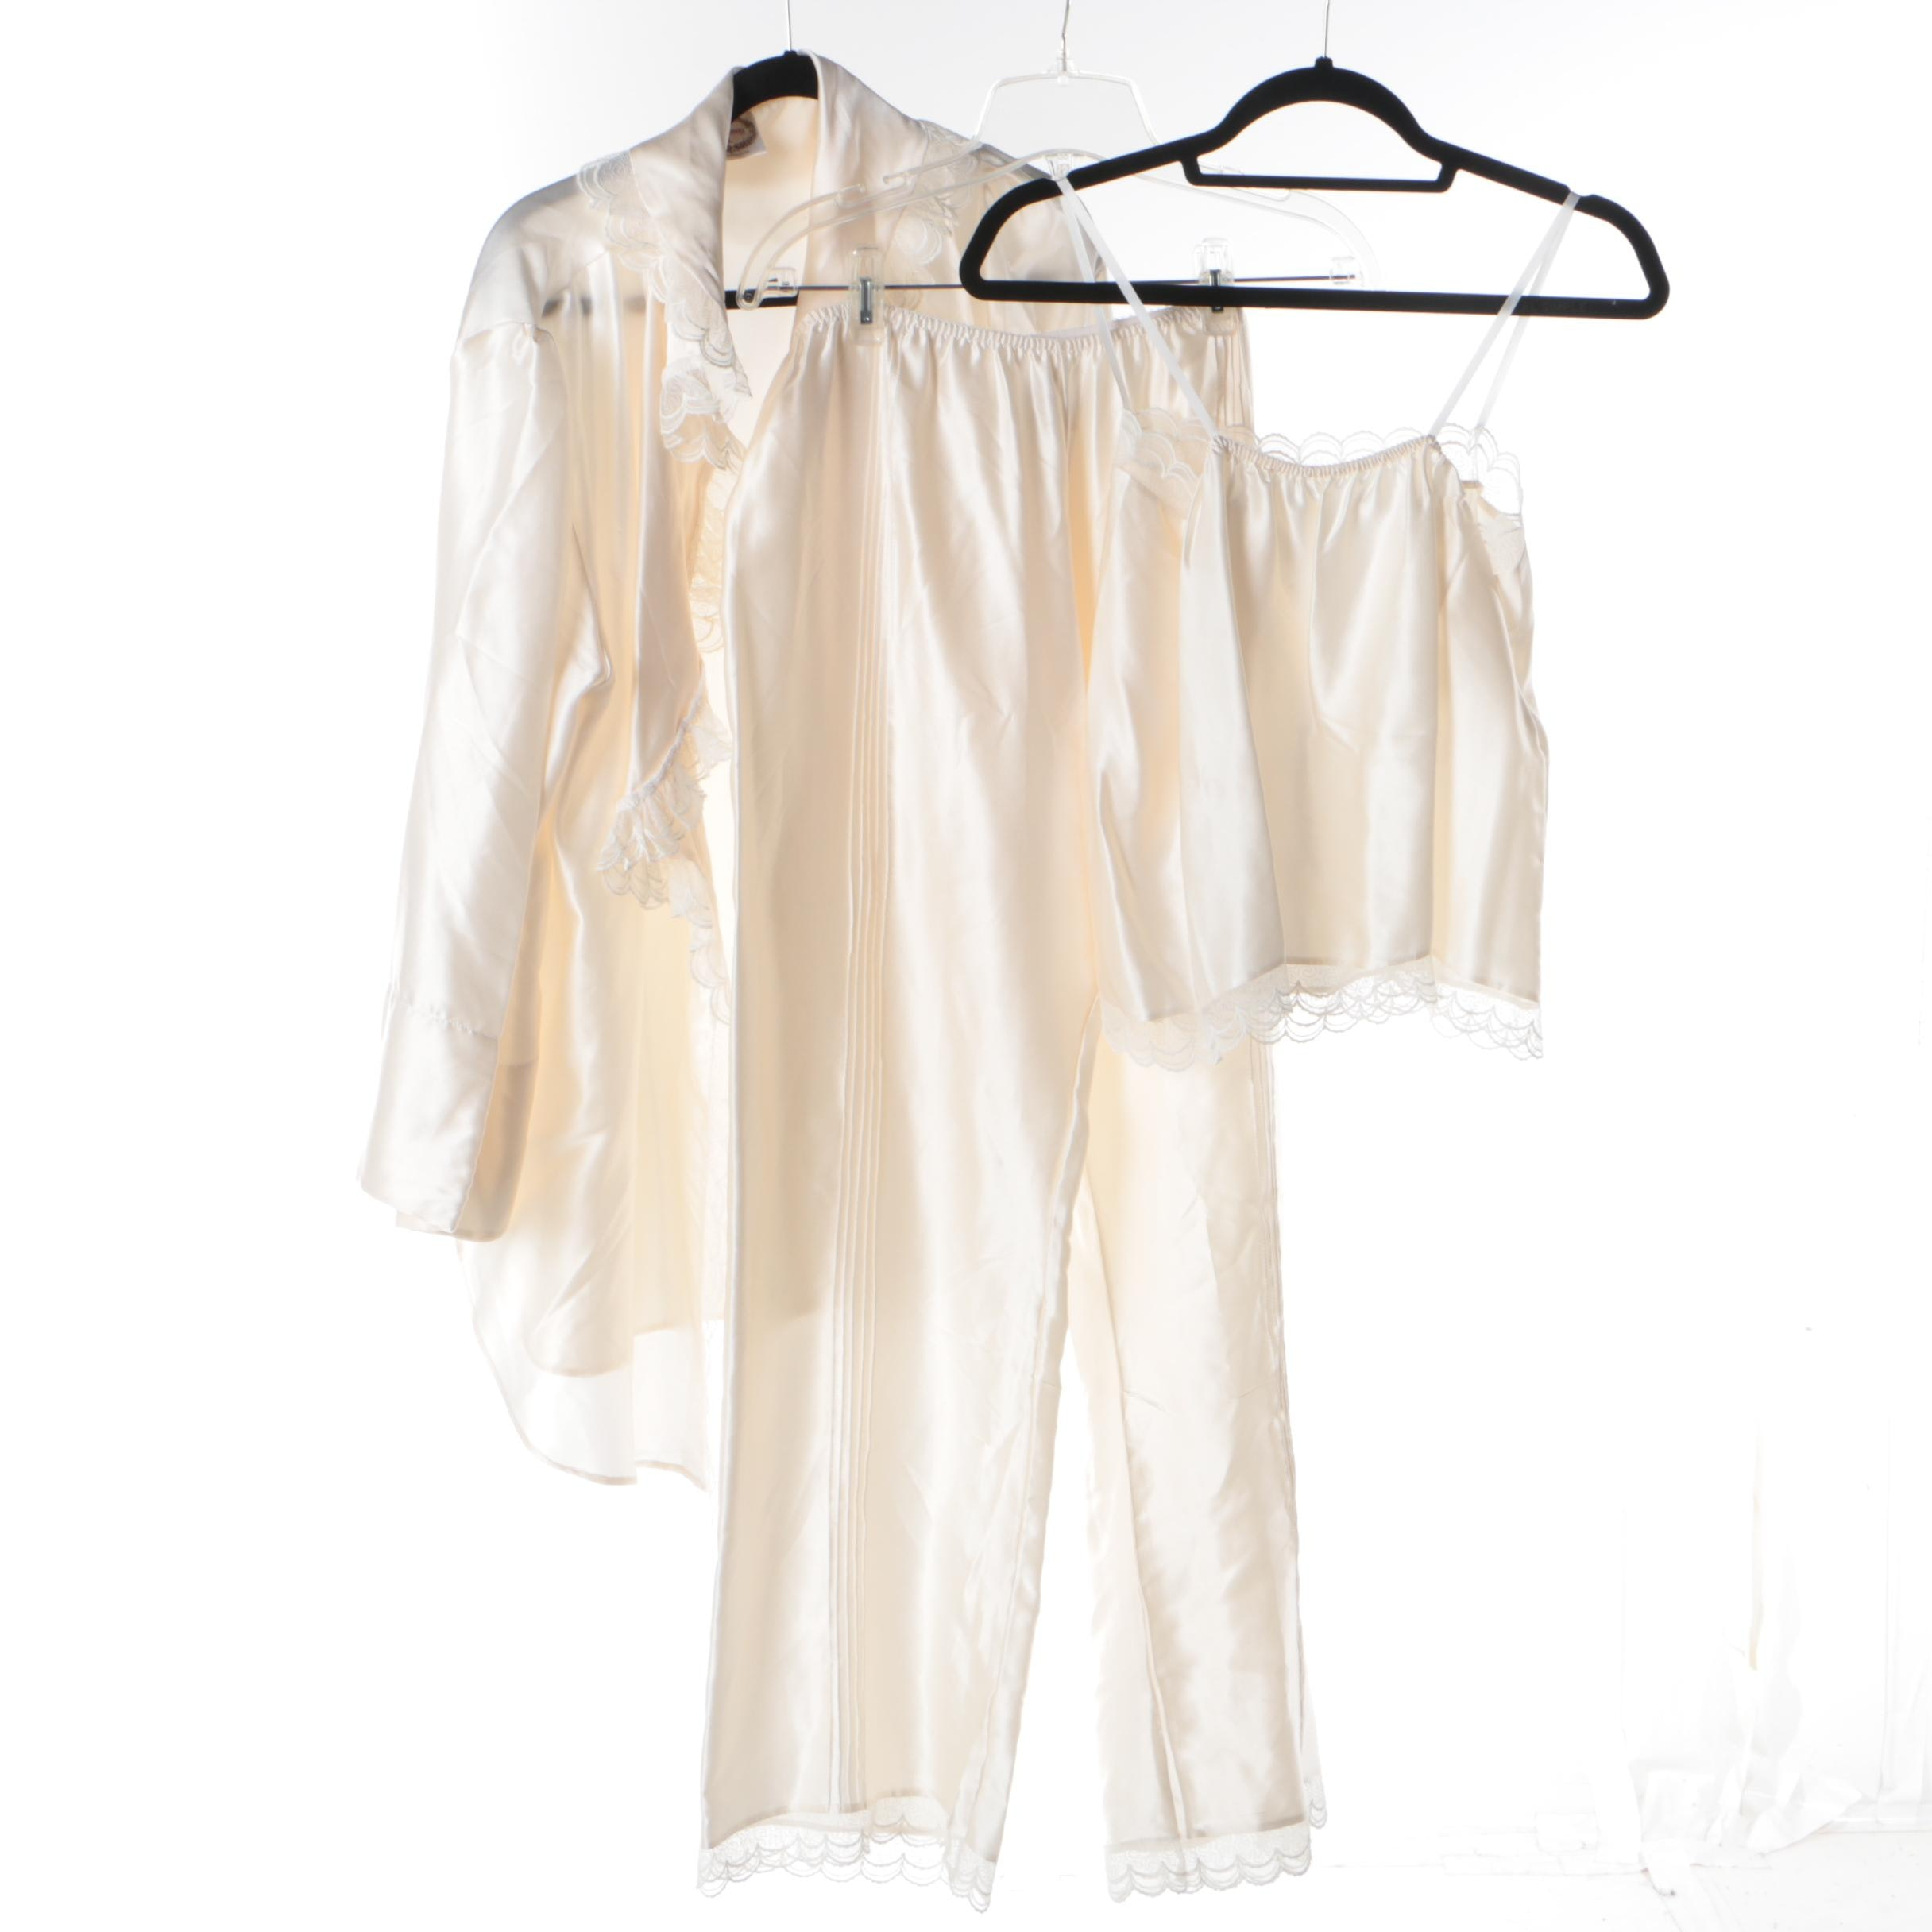 Women's Cobannau Ltd. Ivory Silk Three-Piece Pajama Set with Lace Trim